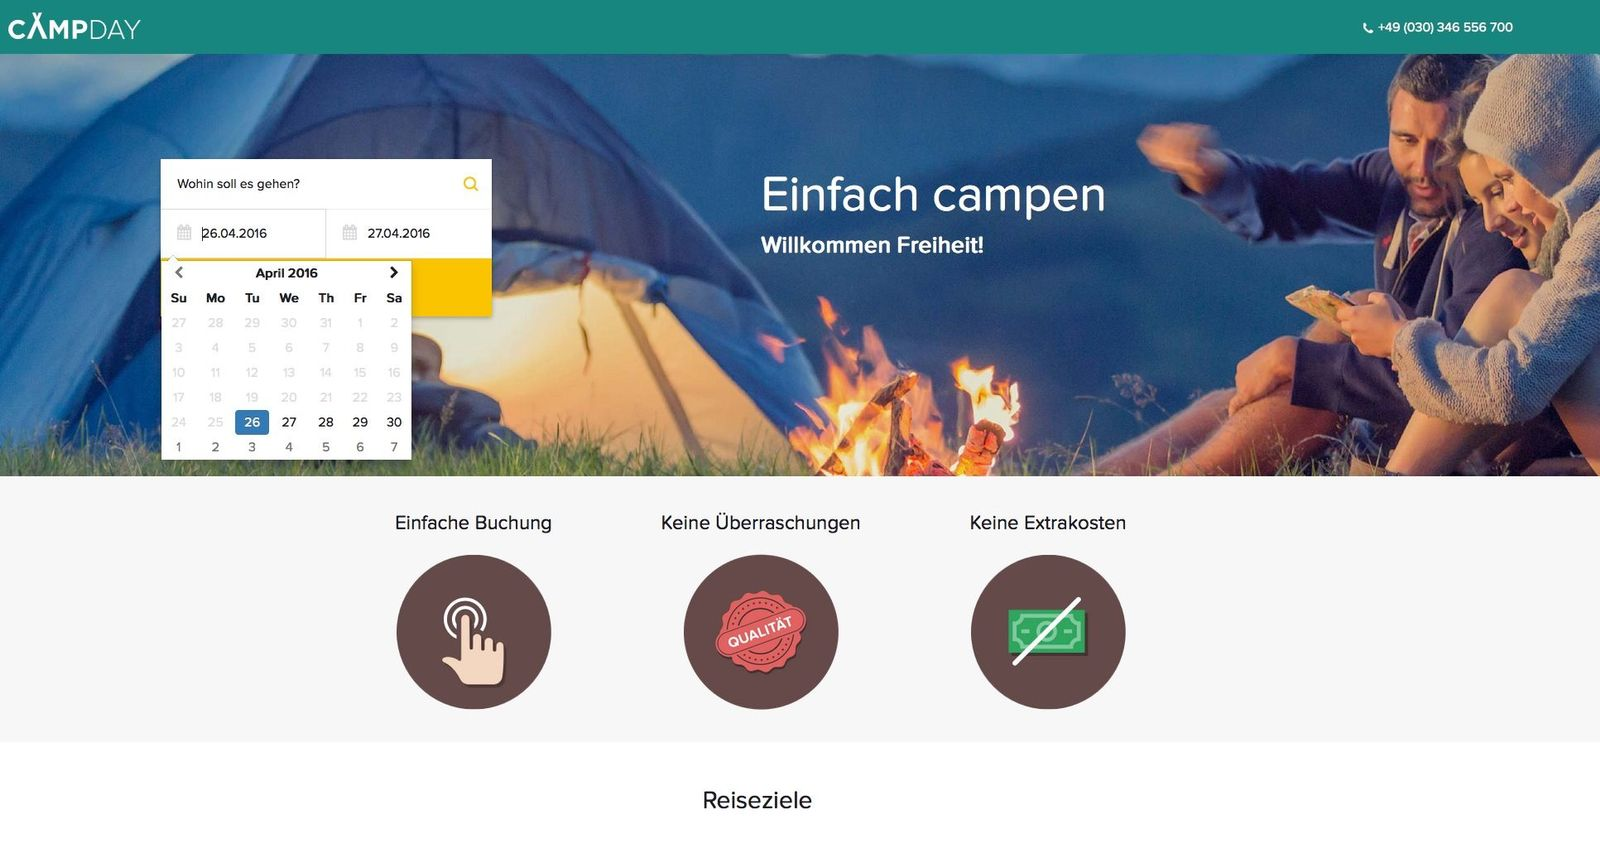 EINMALIGE VERWENDUNG Camping-Portale